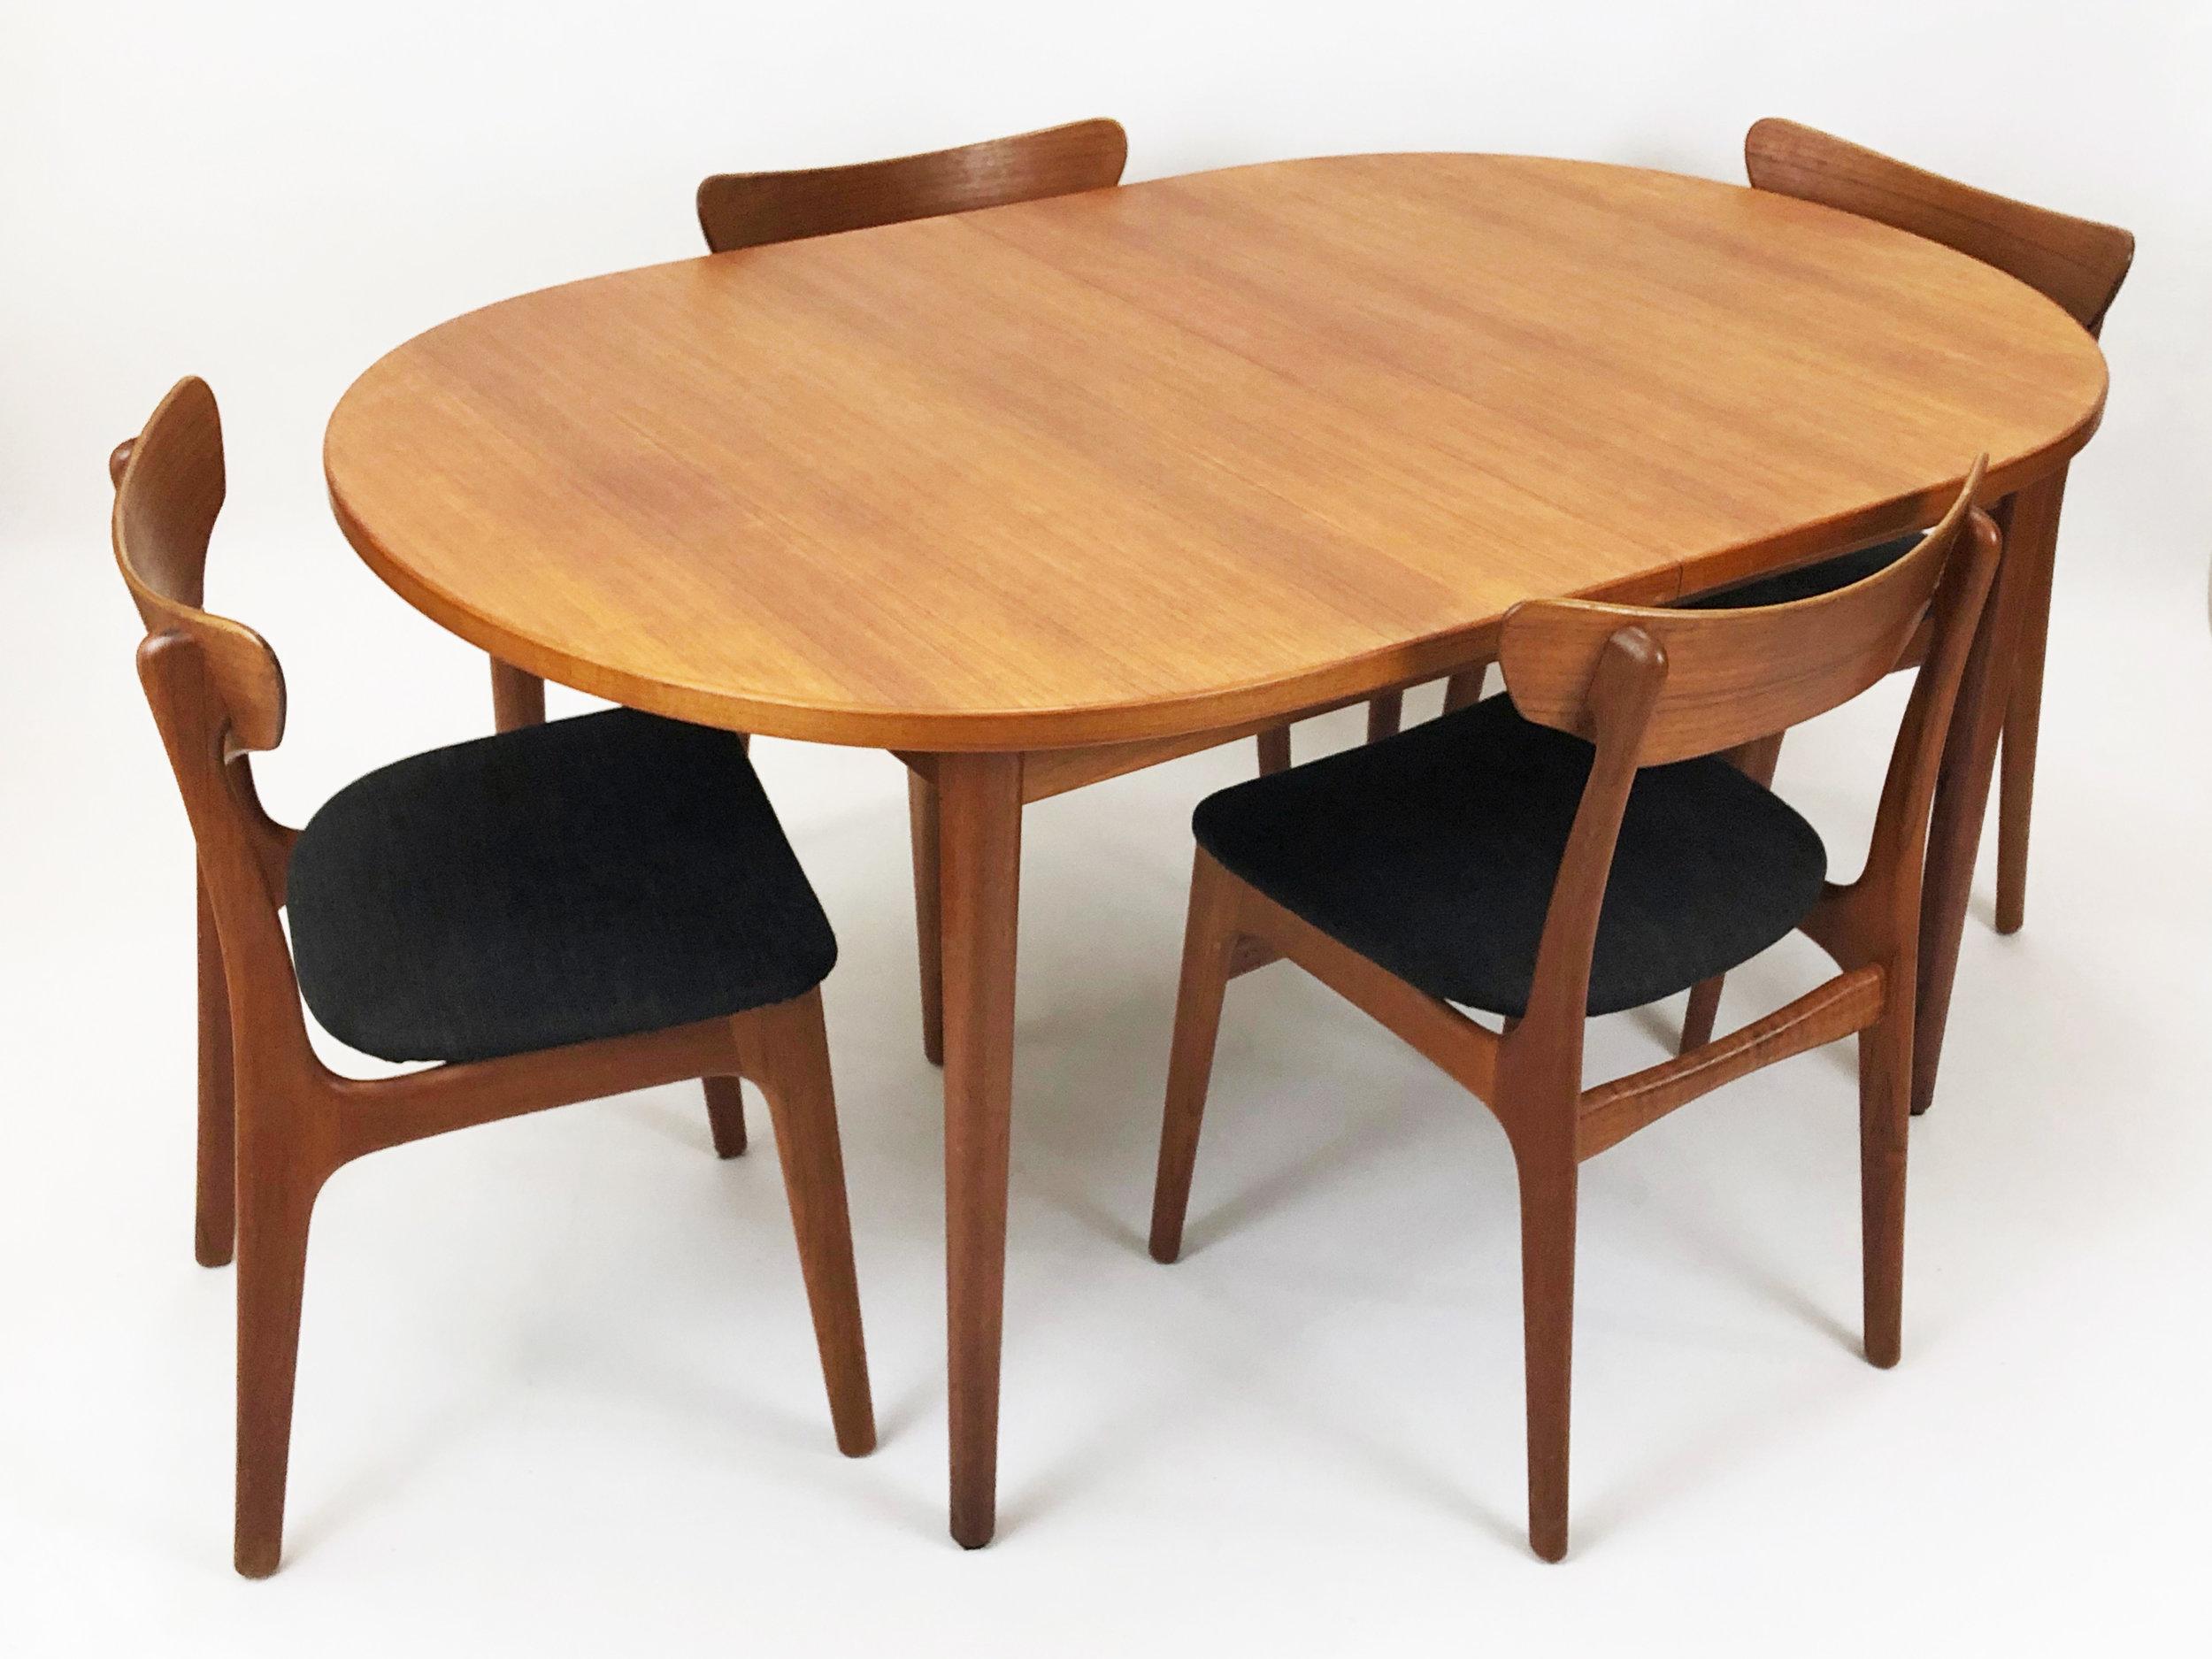 Swedish Teak Dining Table — 84 1/2